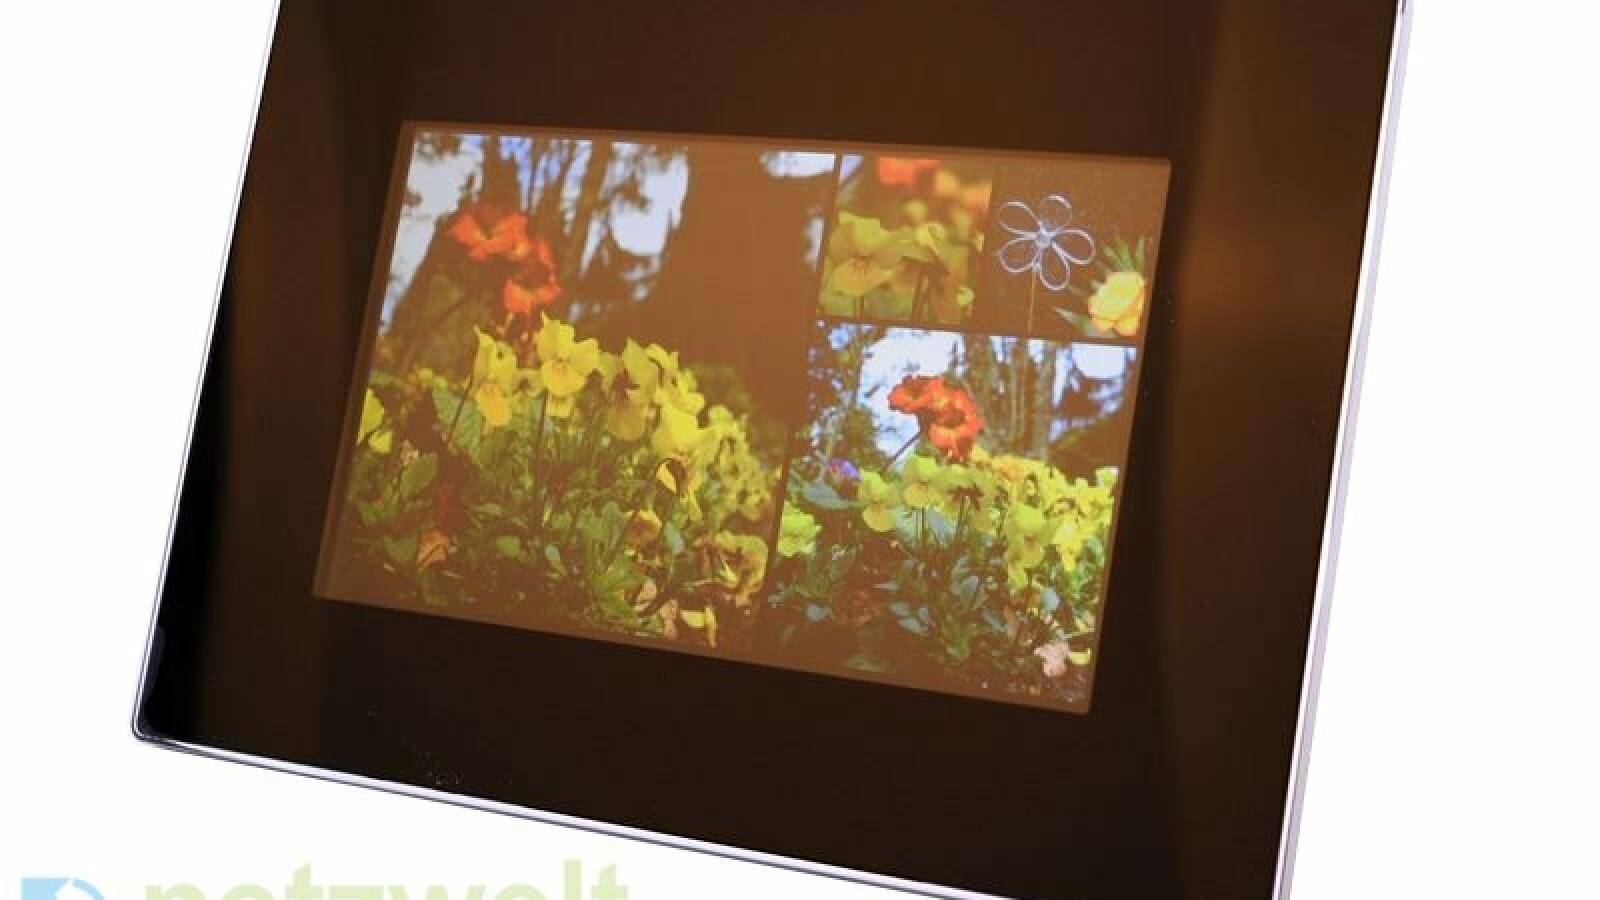 Kodak Easyshare S730 im Test: Tragbarer Bilderrahmen mit Akku - NETZWELT